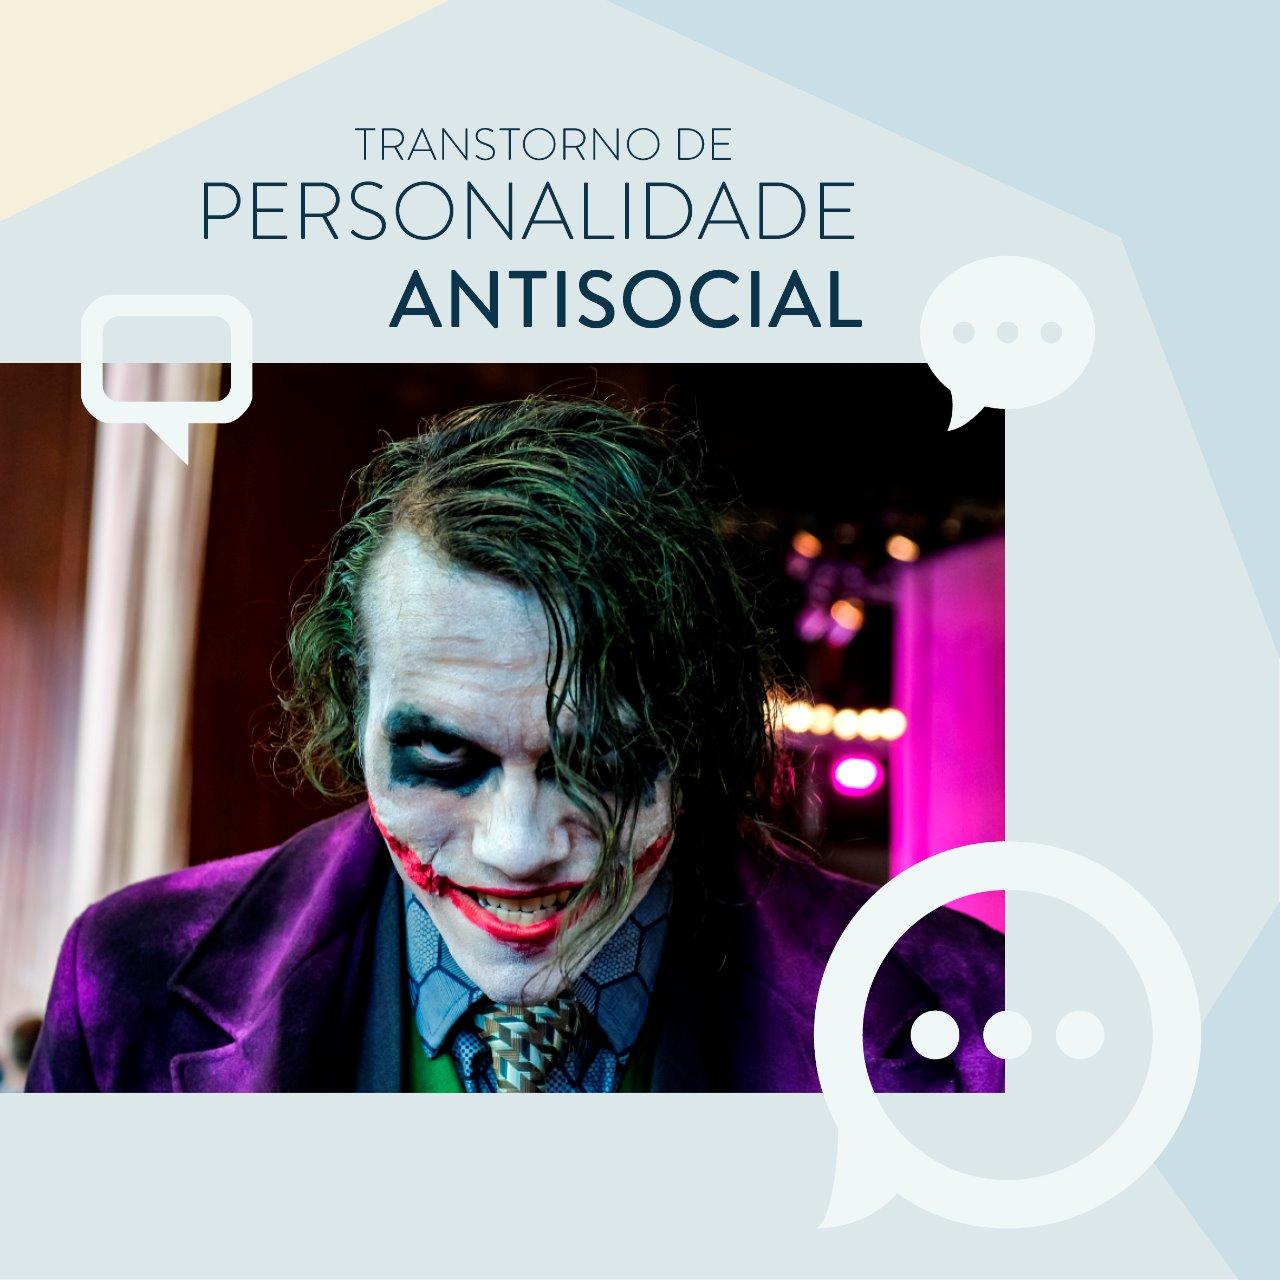 Transtorno de personalidade antisocial: o que é